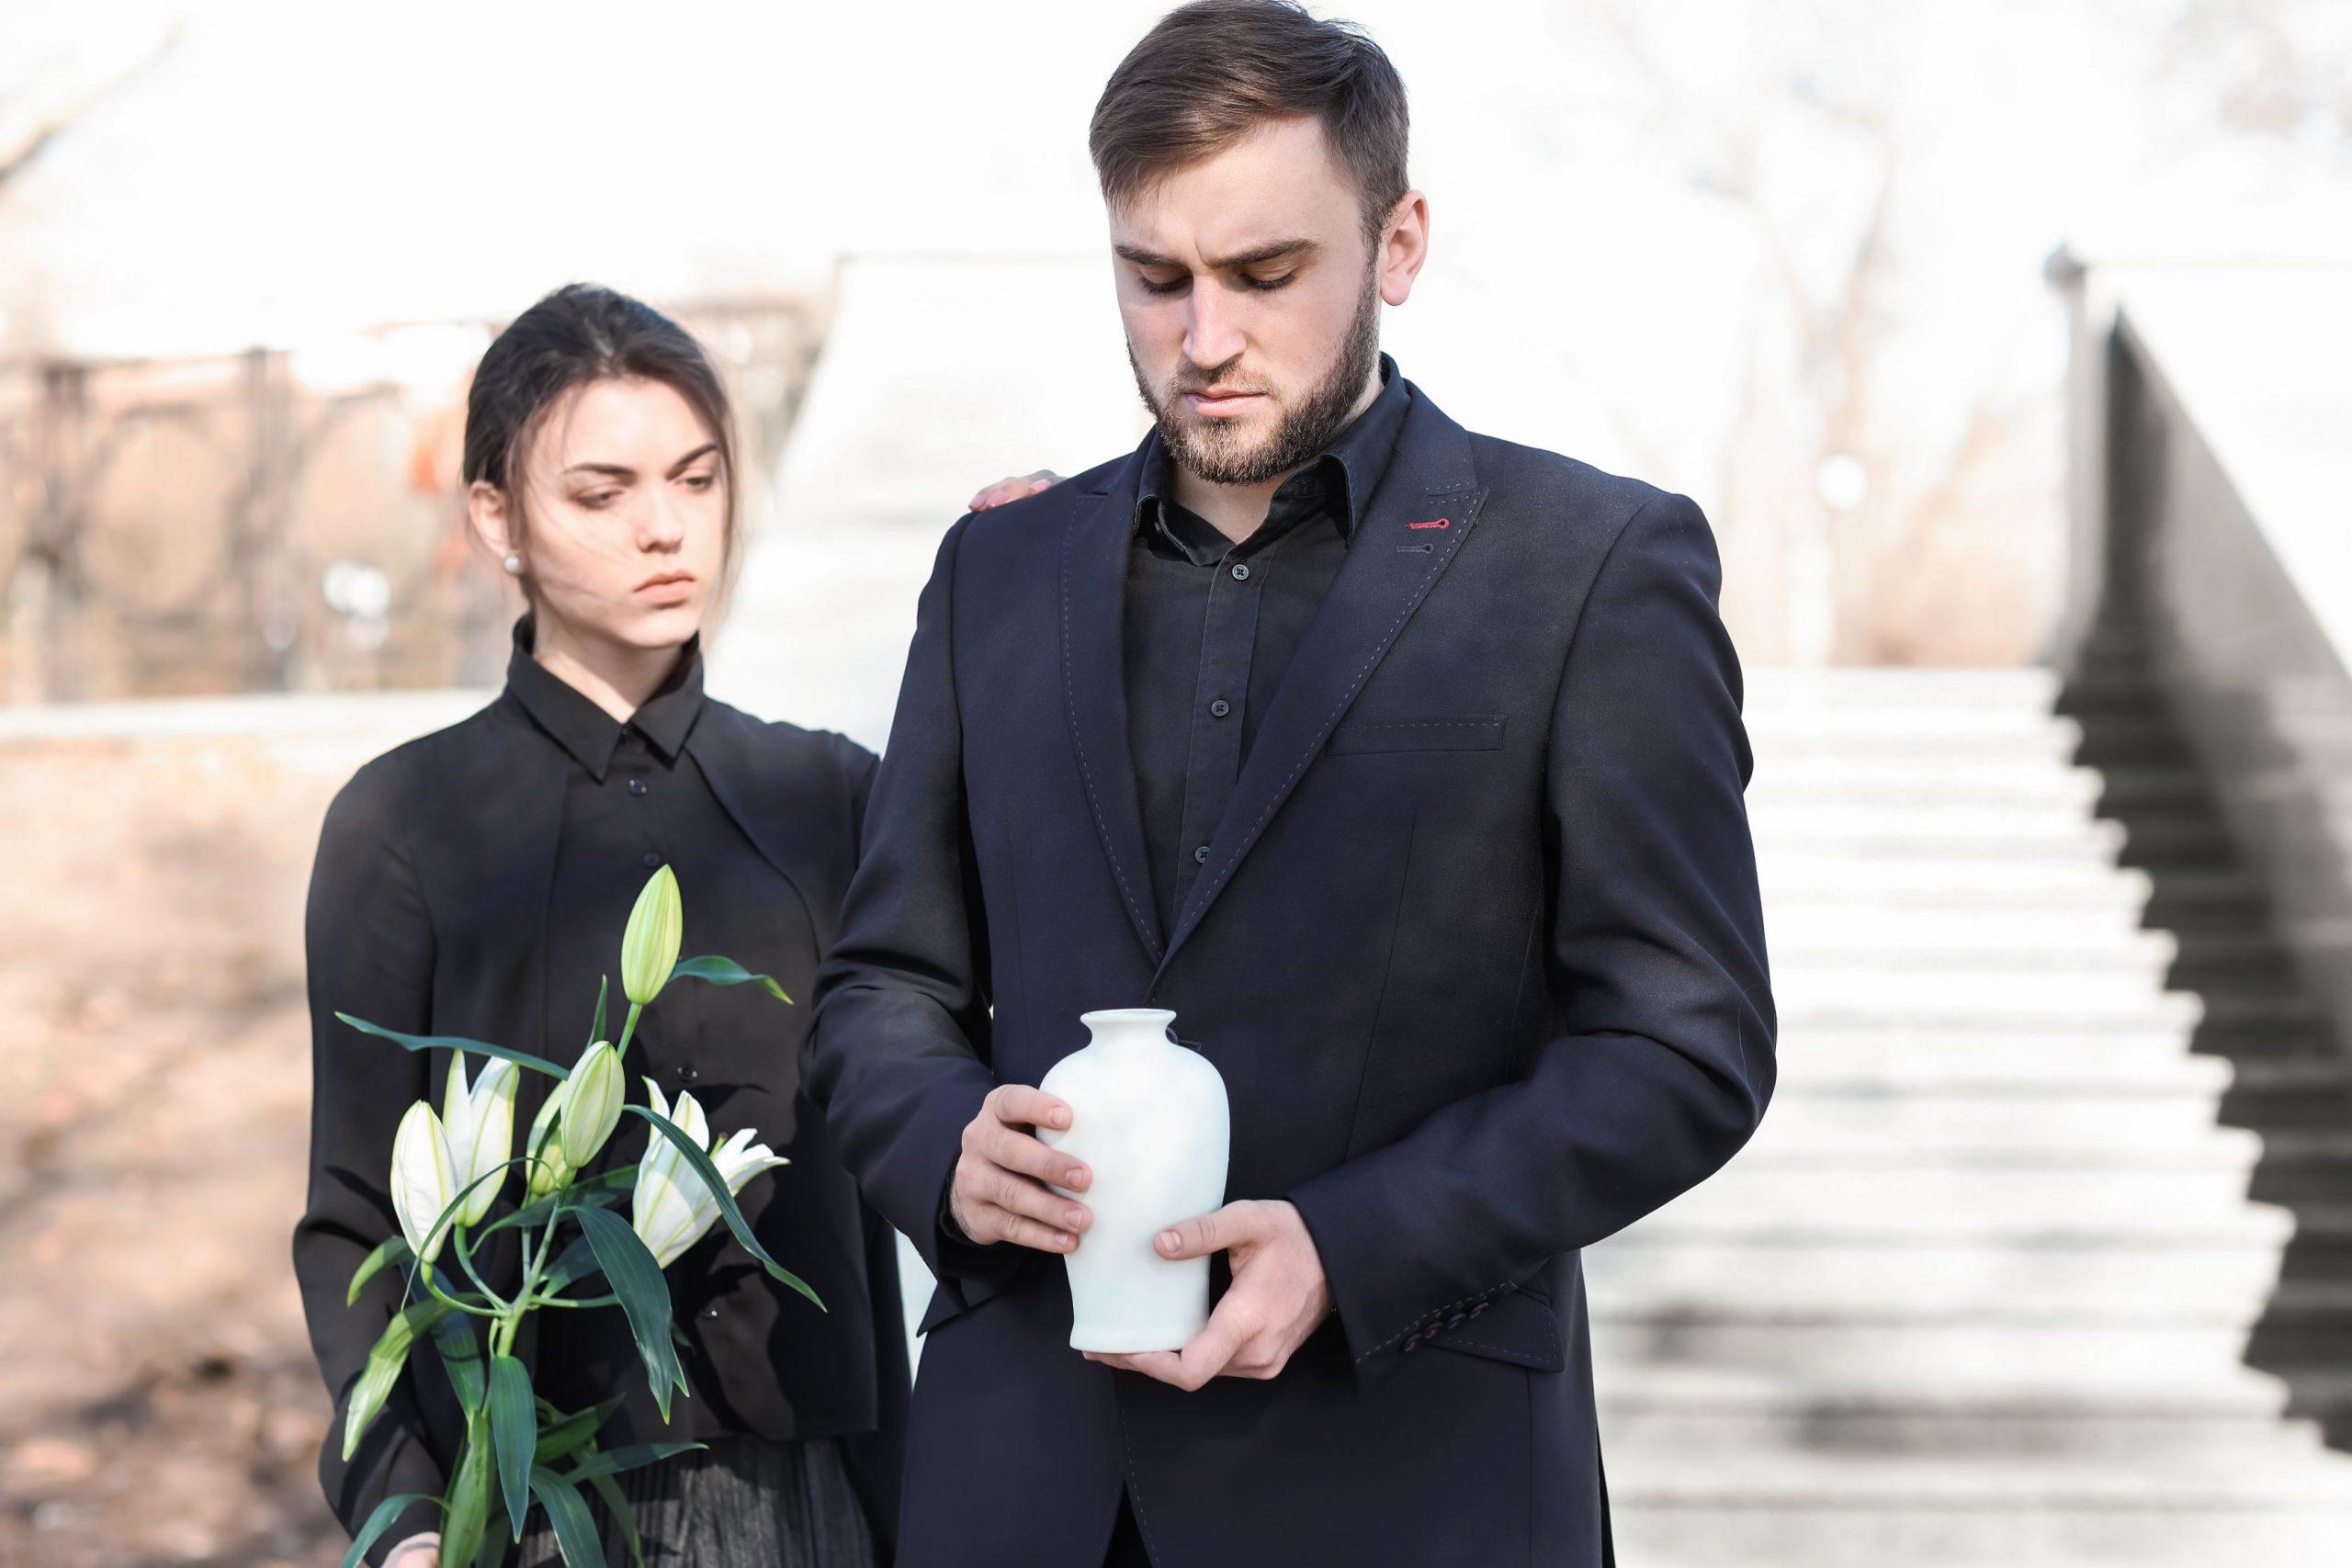 incineration cremation inhumation avantages